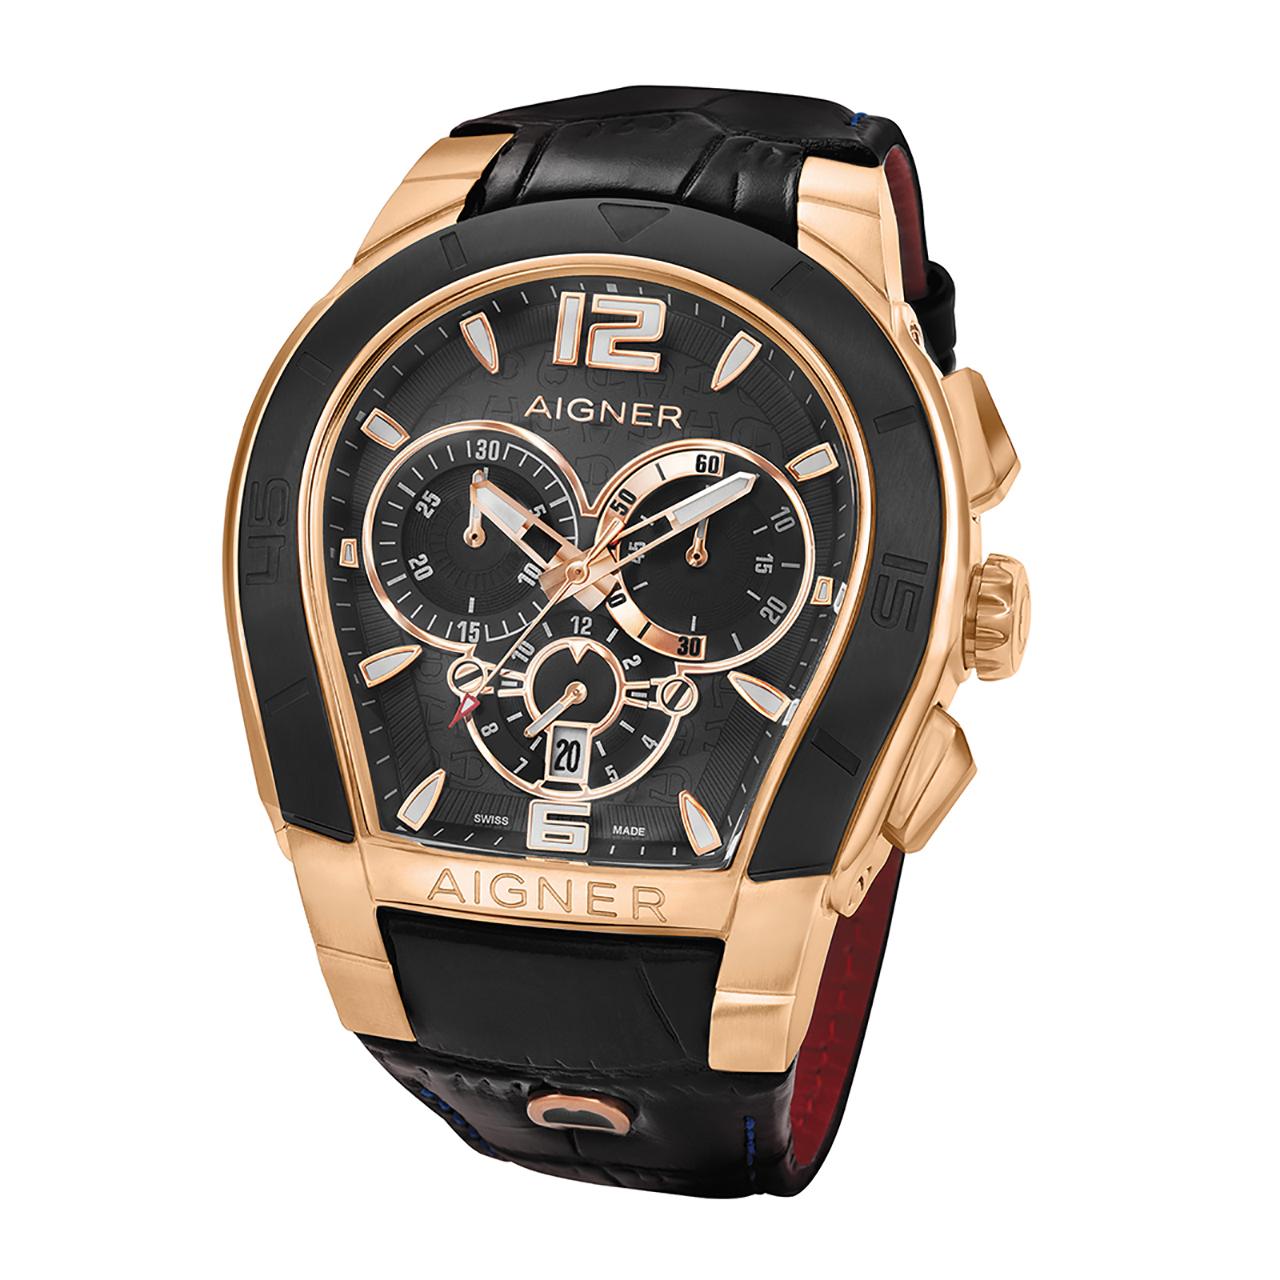 ساعت مچی عقربه ای مردانه اگنر مدل A58510